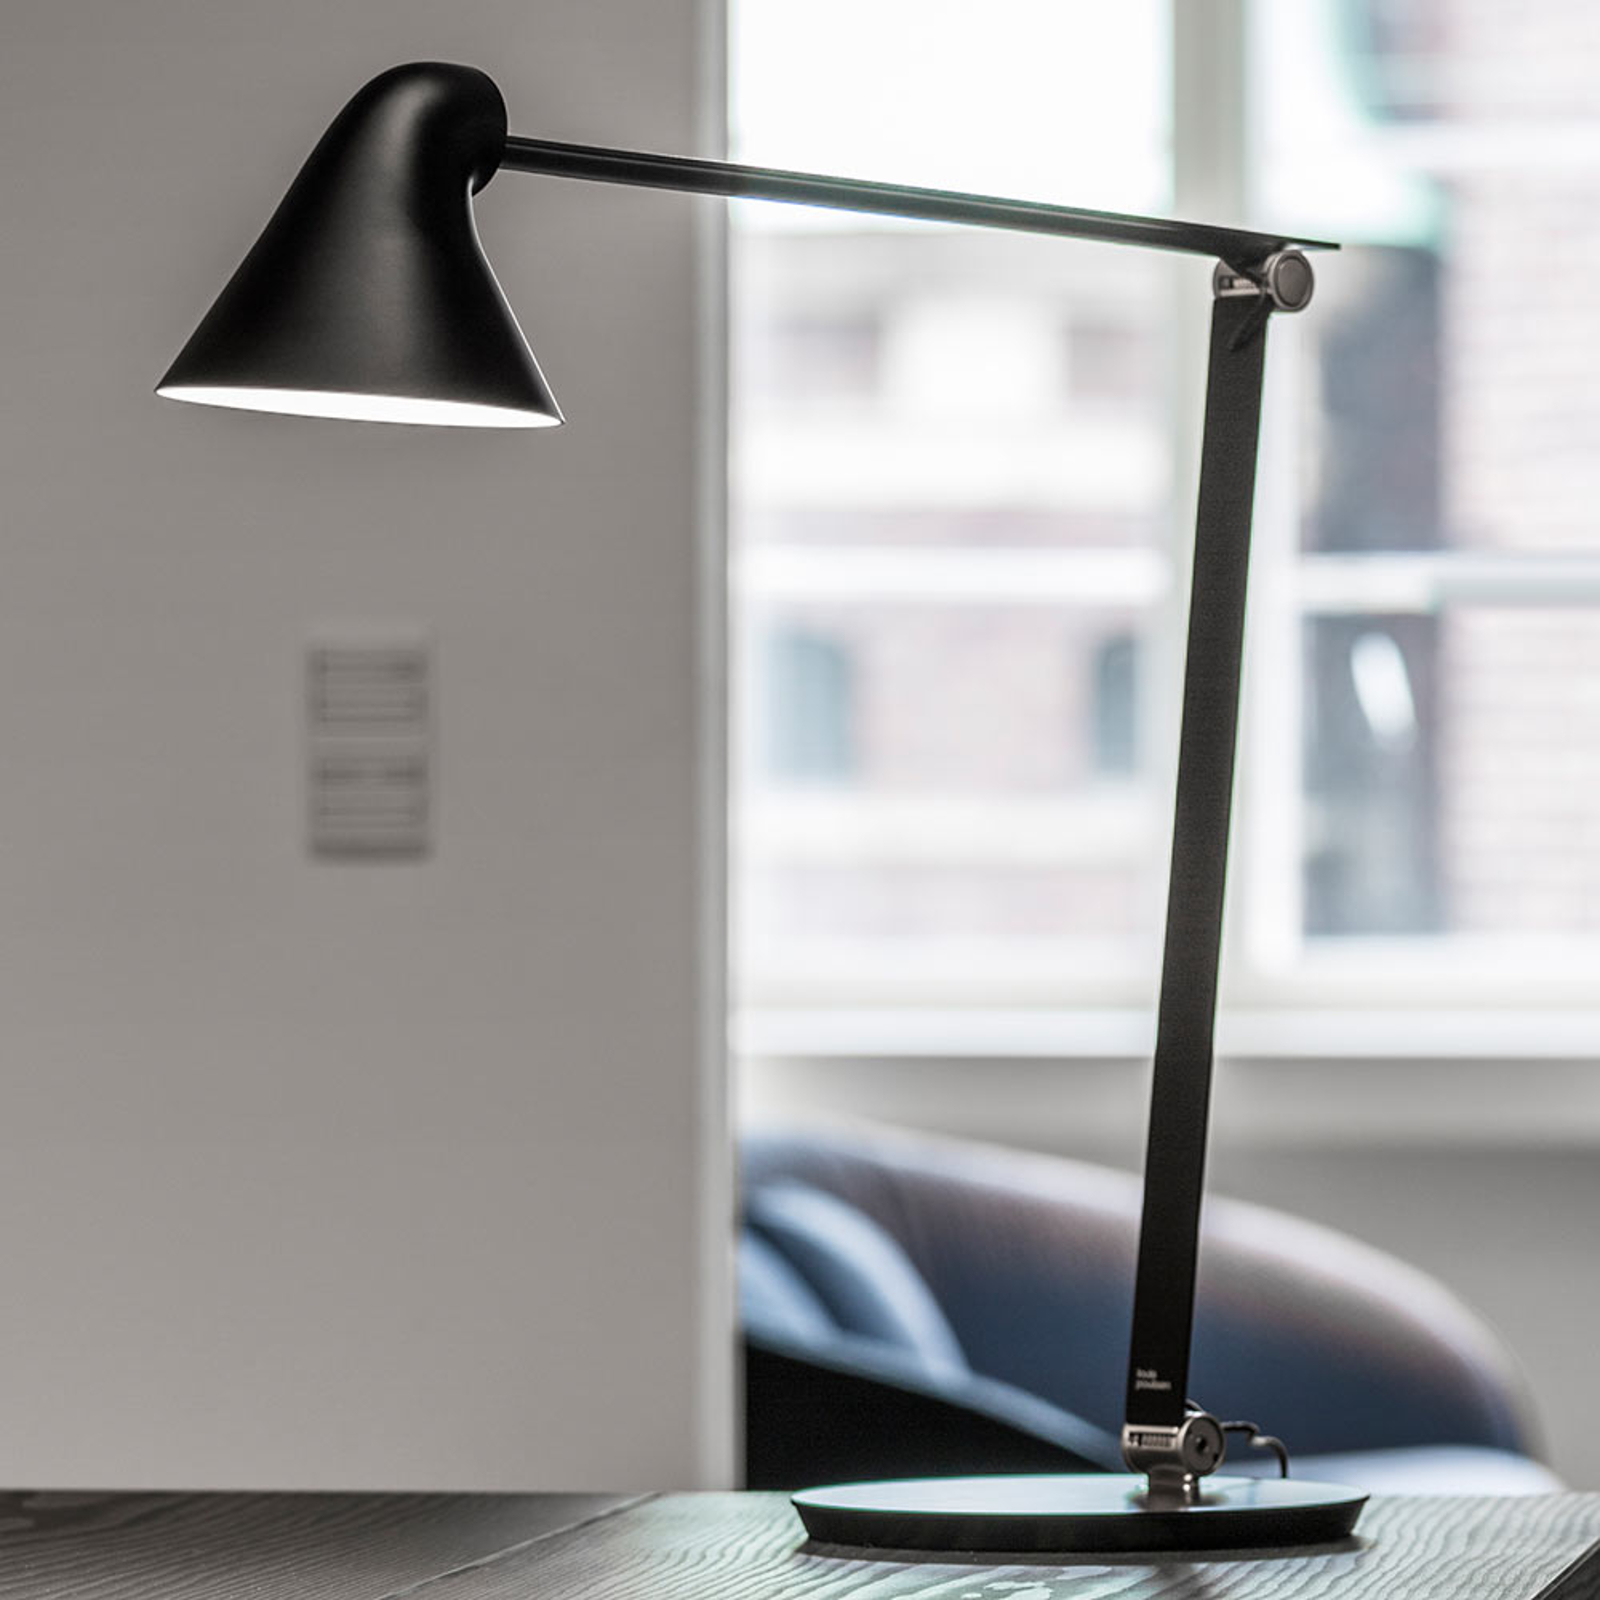 Louis Poulsen NJP bordlampe fot 2700K svart